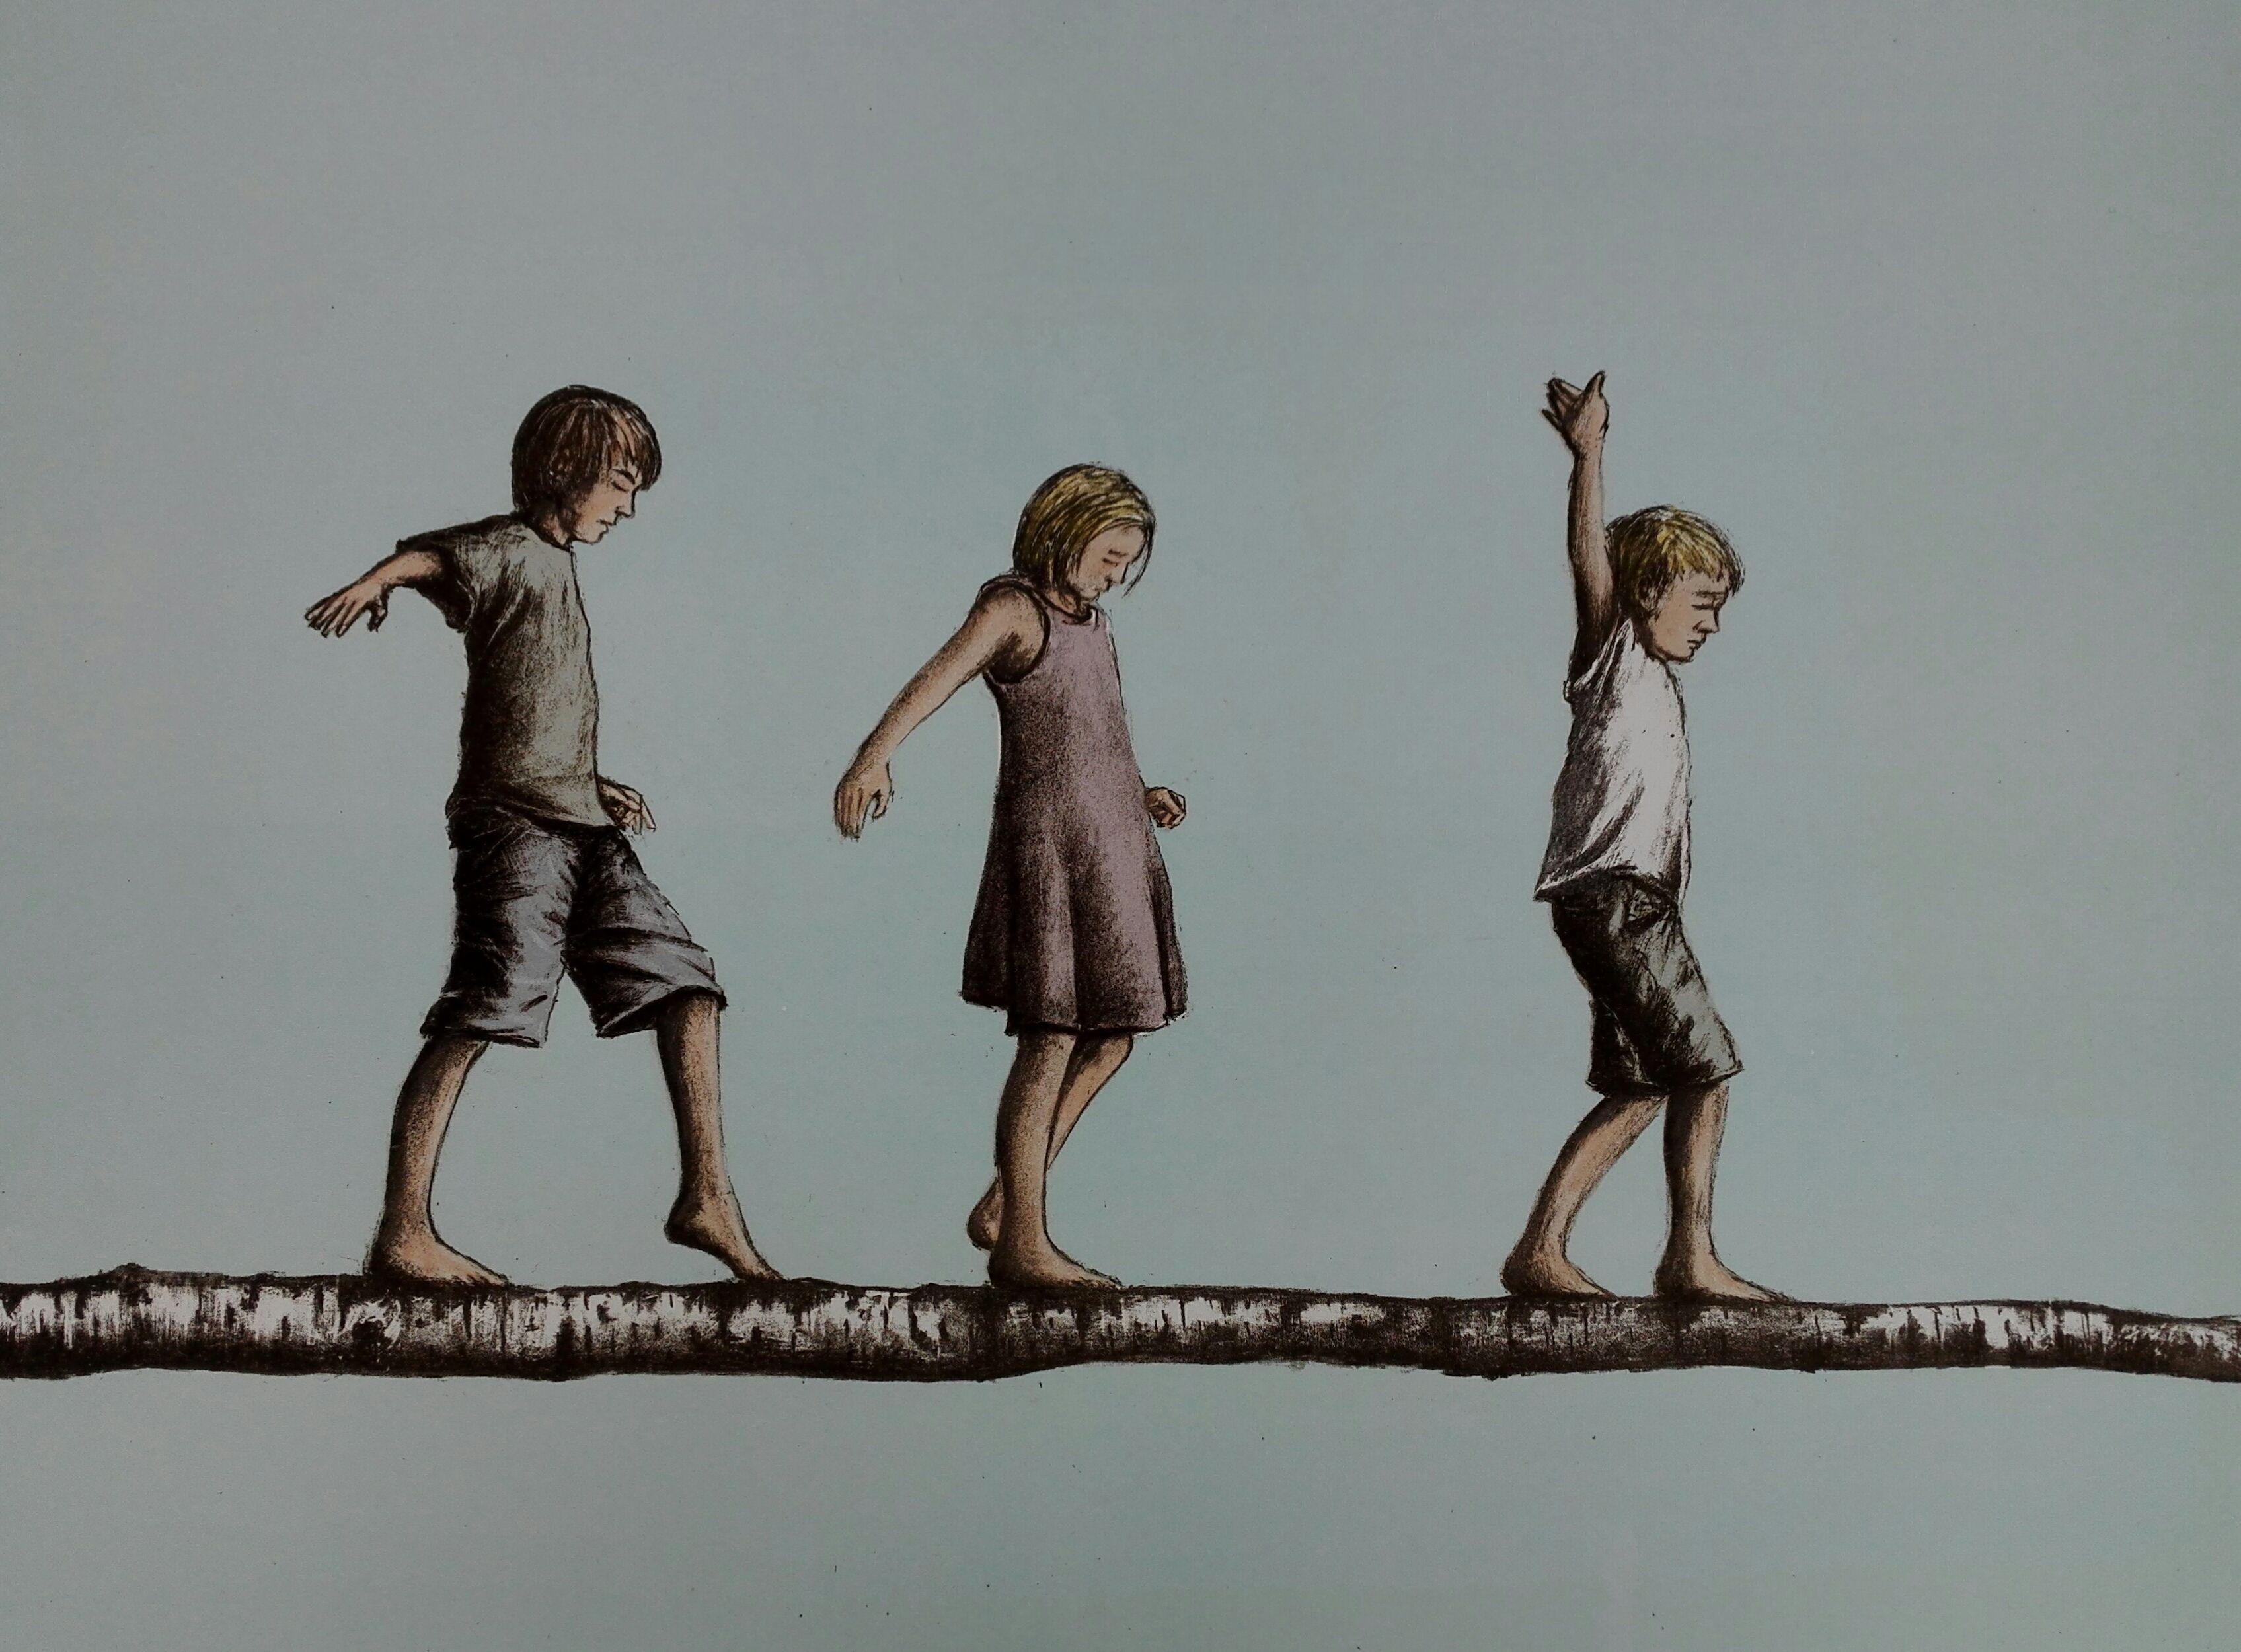 Galleri D40 - Tom Erik Andersen - Never leave your childhood behind